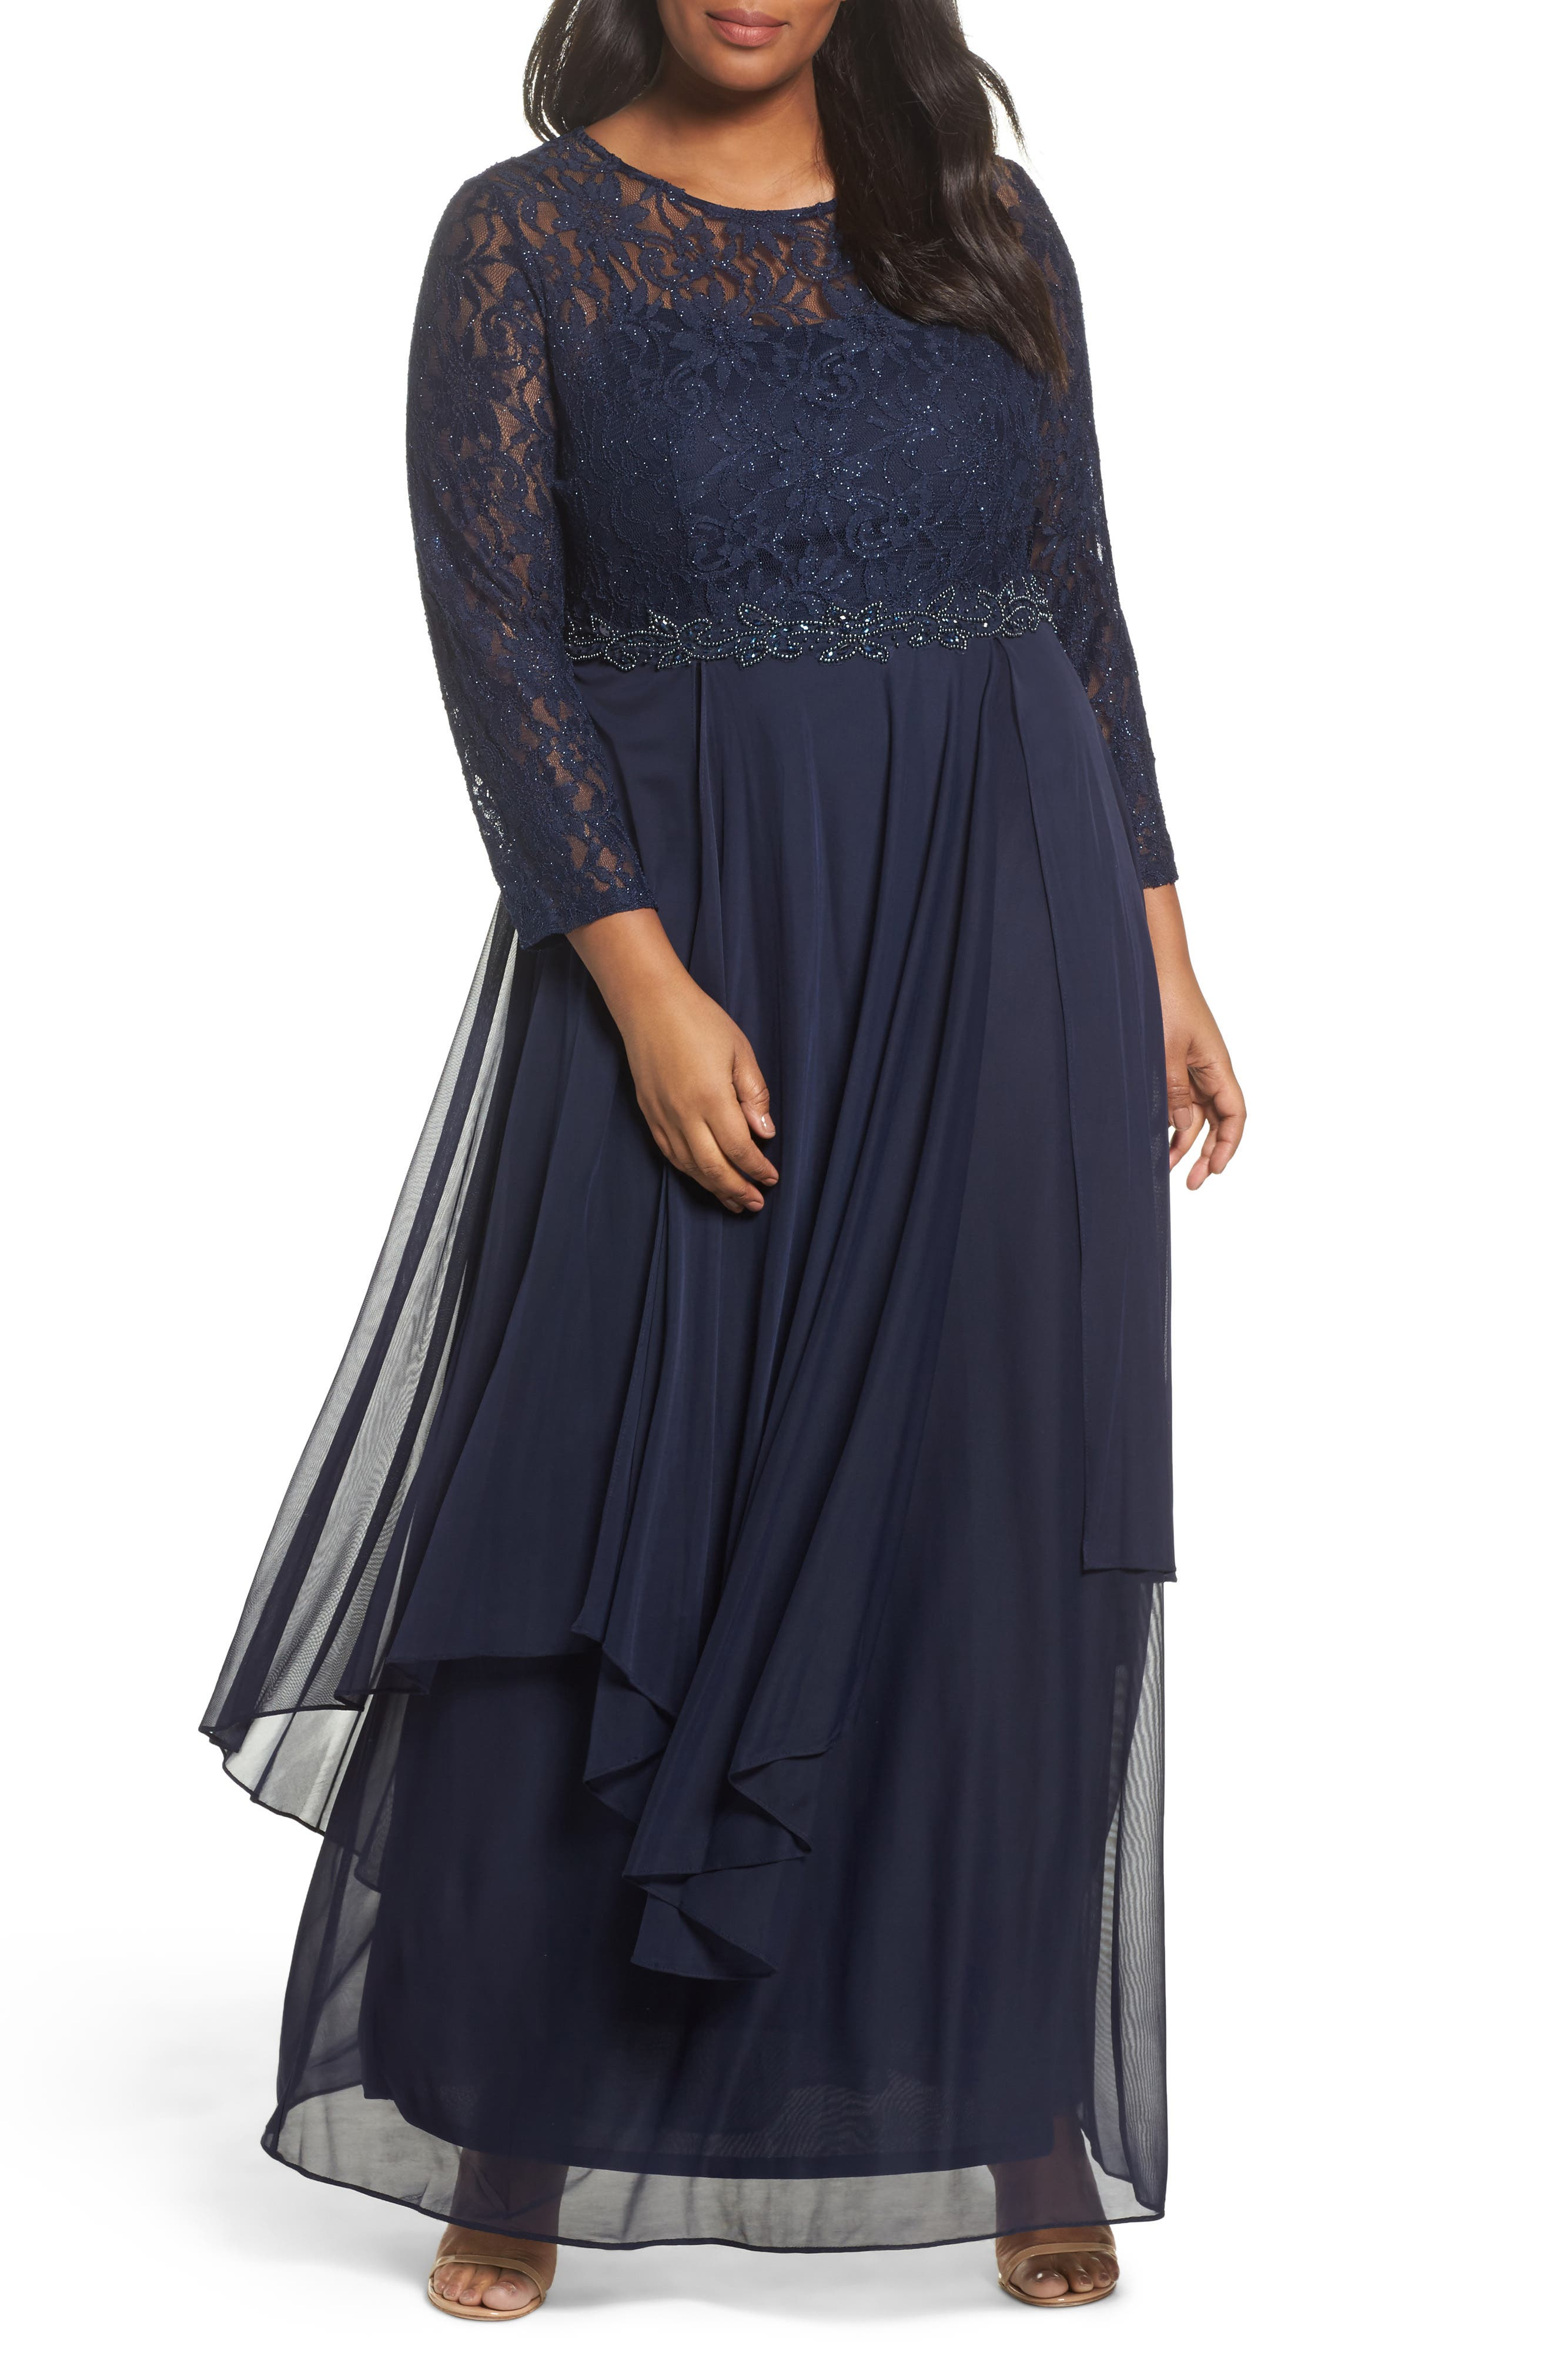 Main Image - Decode 1.8 Lace & Mesh Gown (Plus Size)